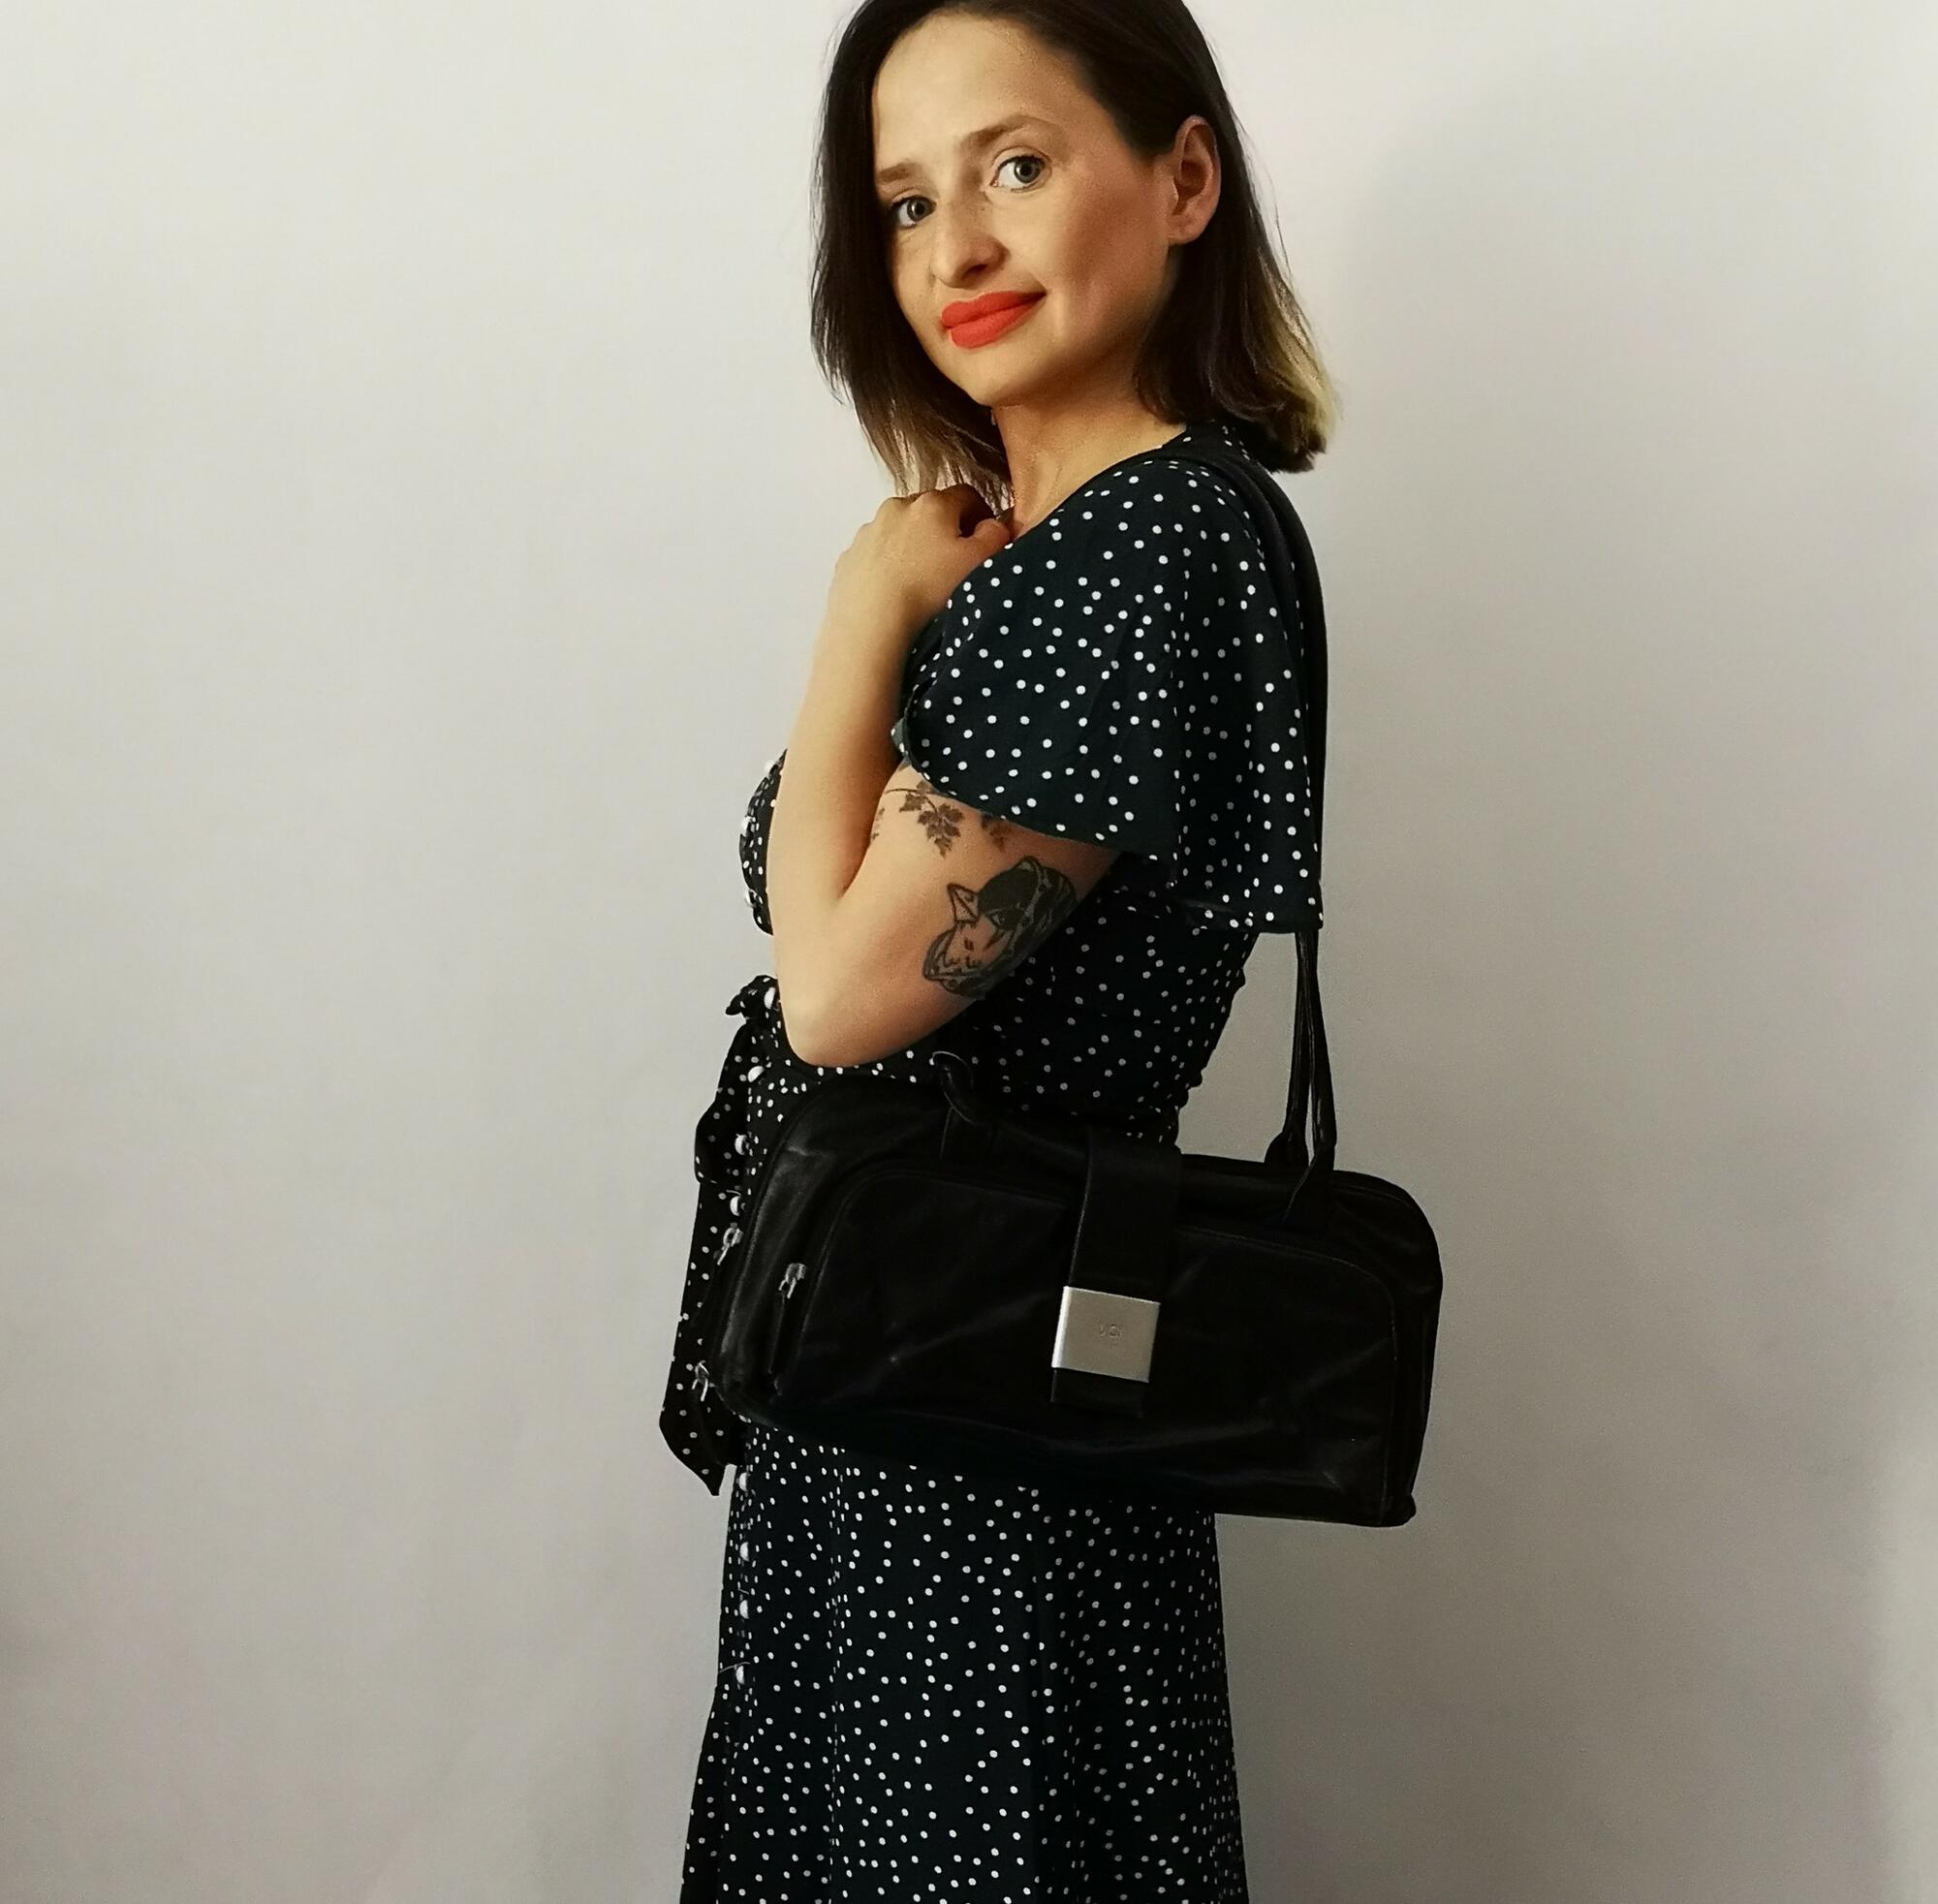 Voi design skórzana torebka vintage - Nie byle | JestemSlow.pl